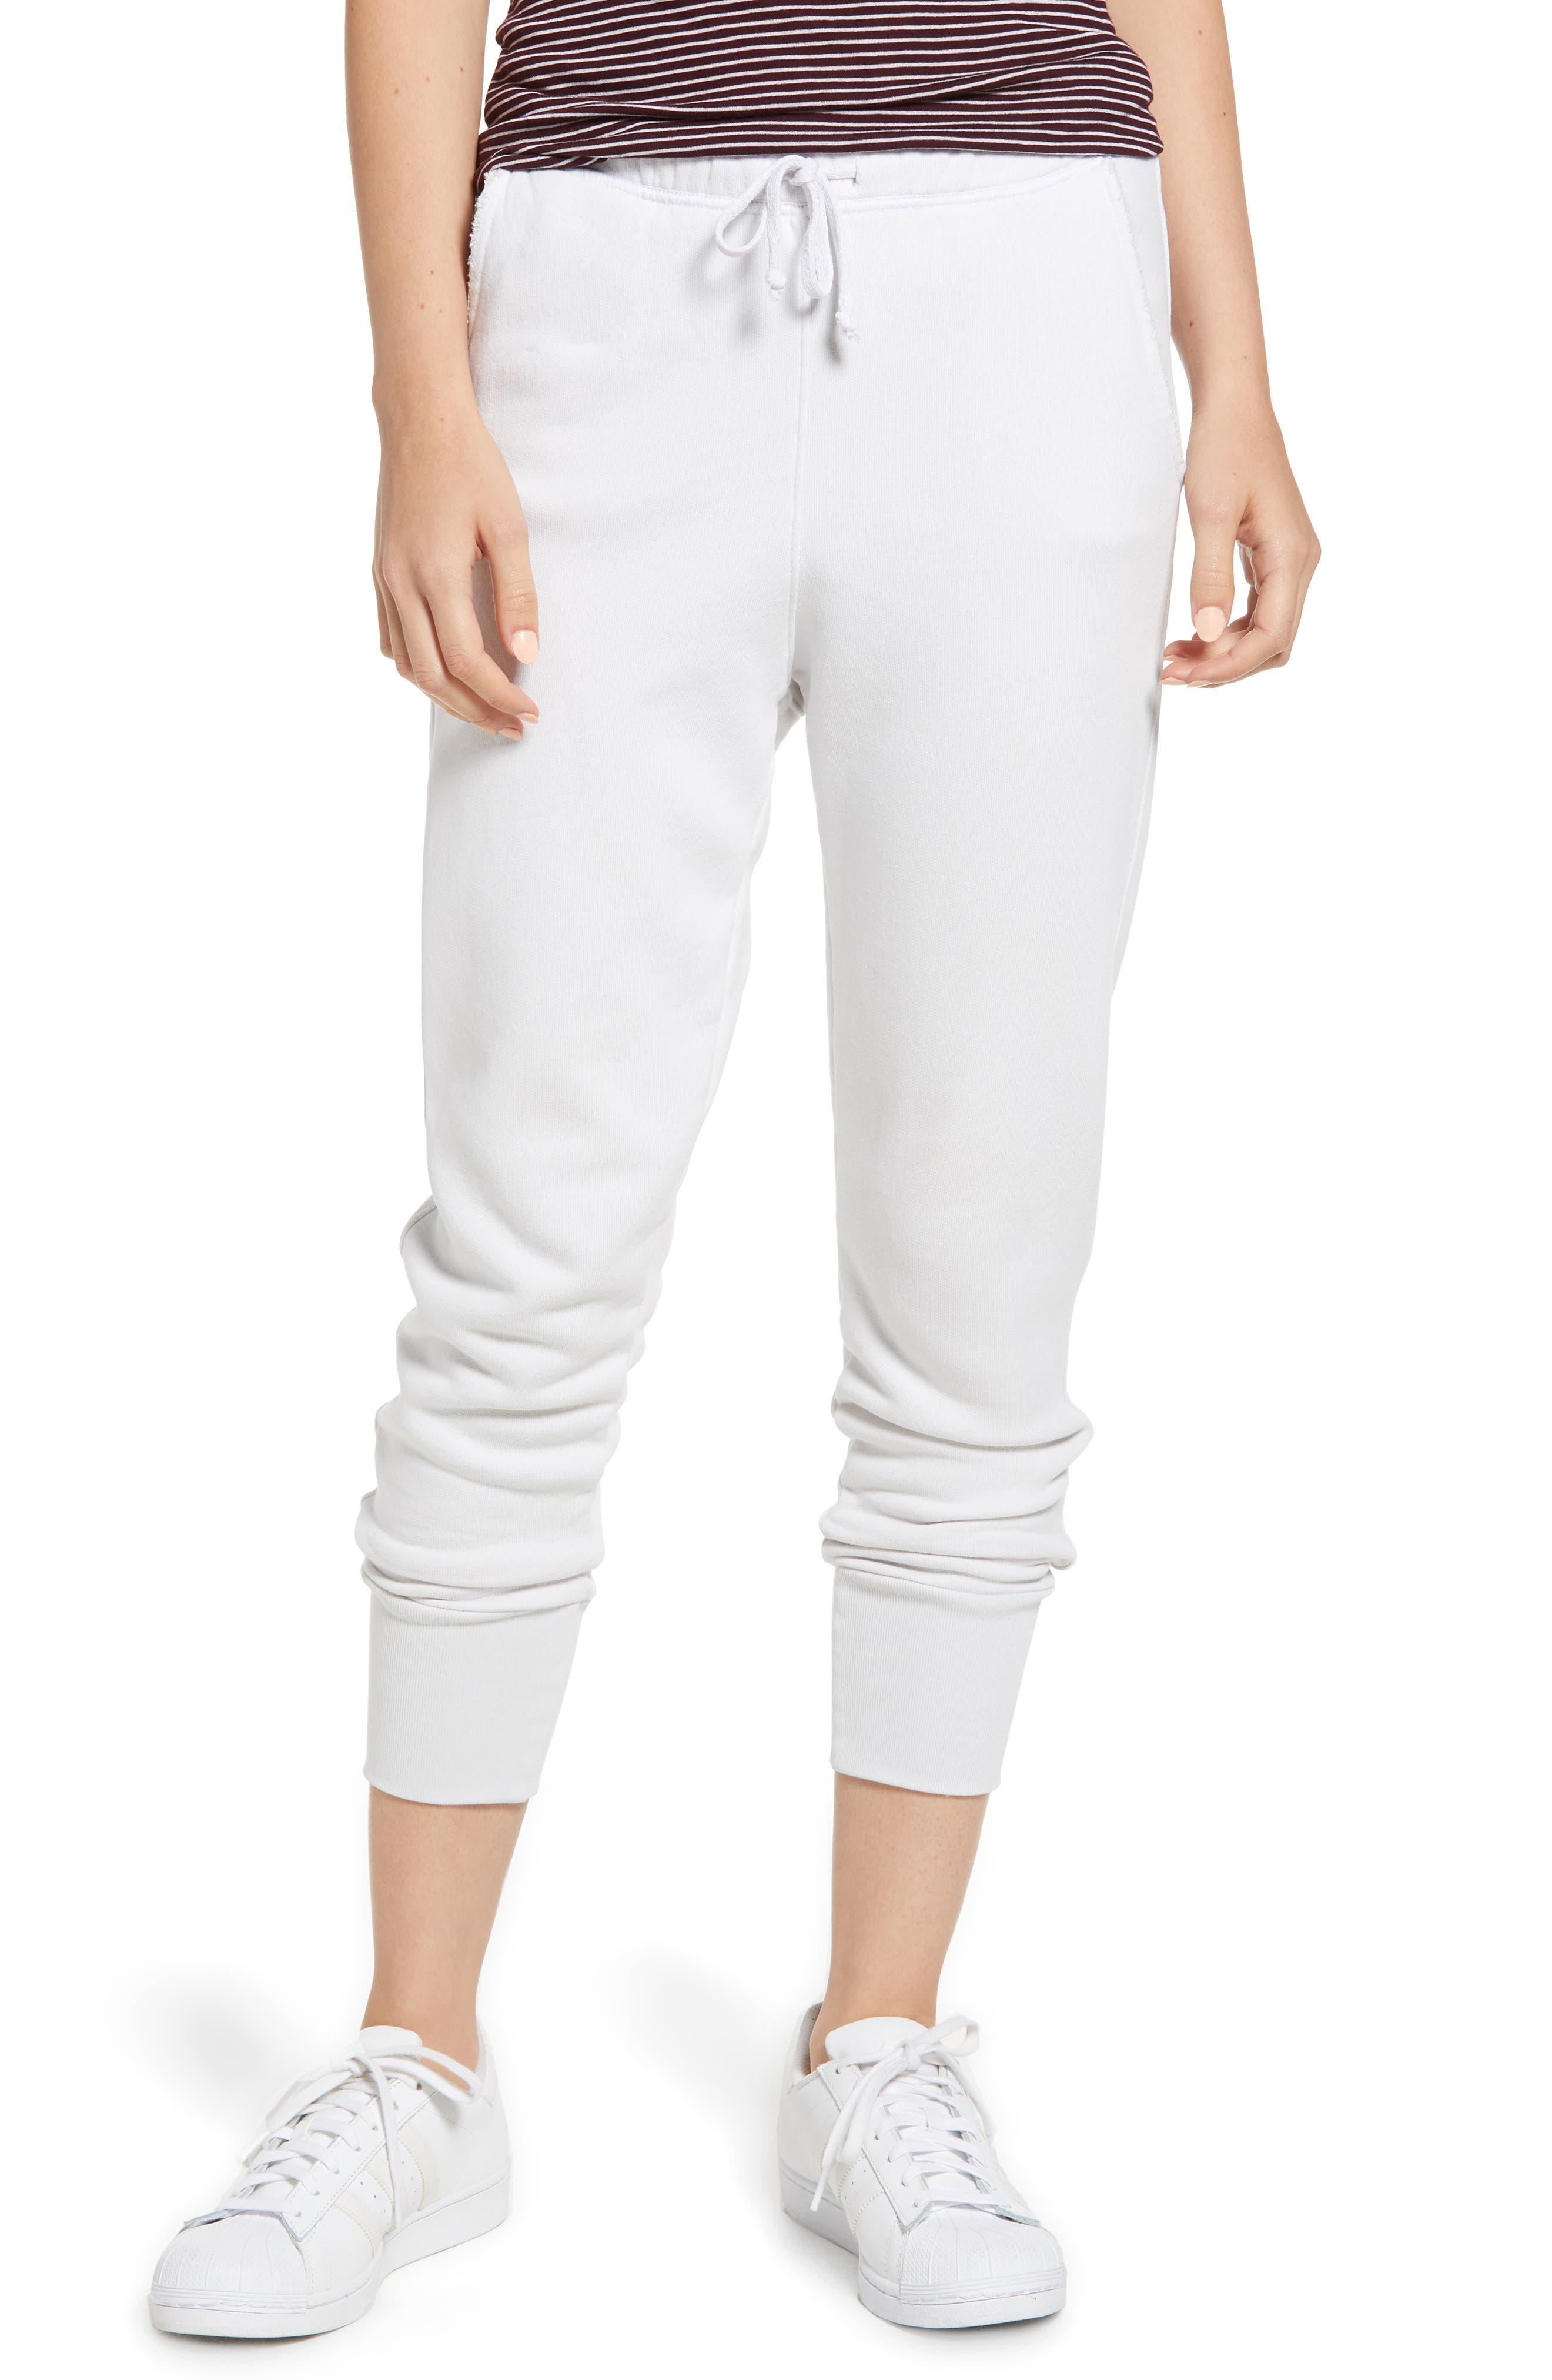 FRANK & EILEEN TEE LAB Cotton Fleece Cuffed Jogger Sweatpants in Dirty White